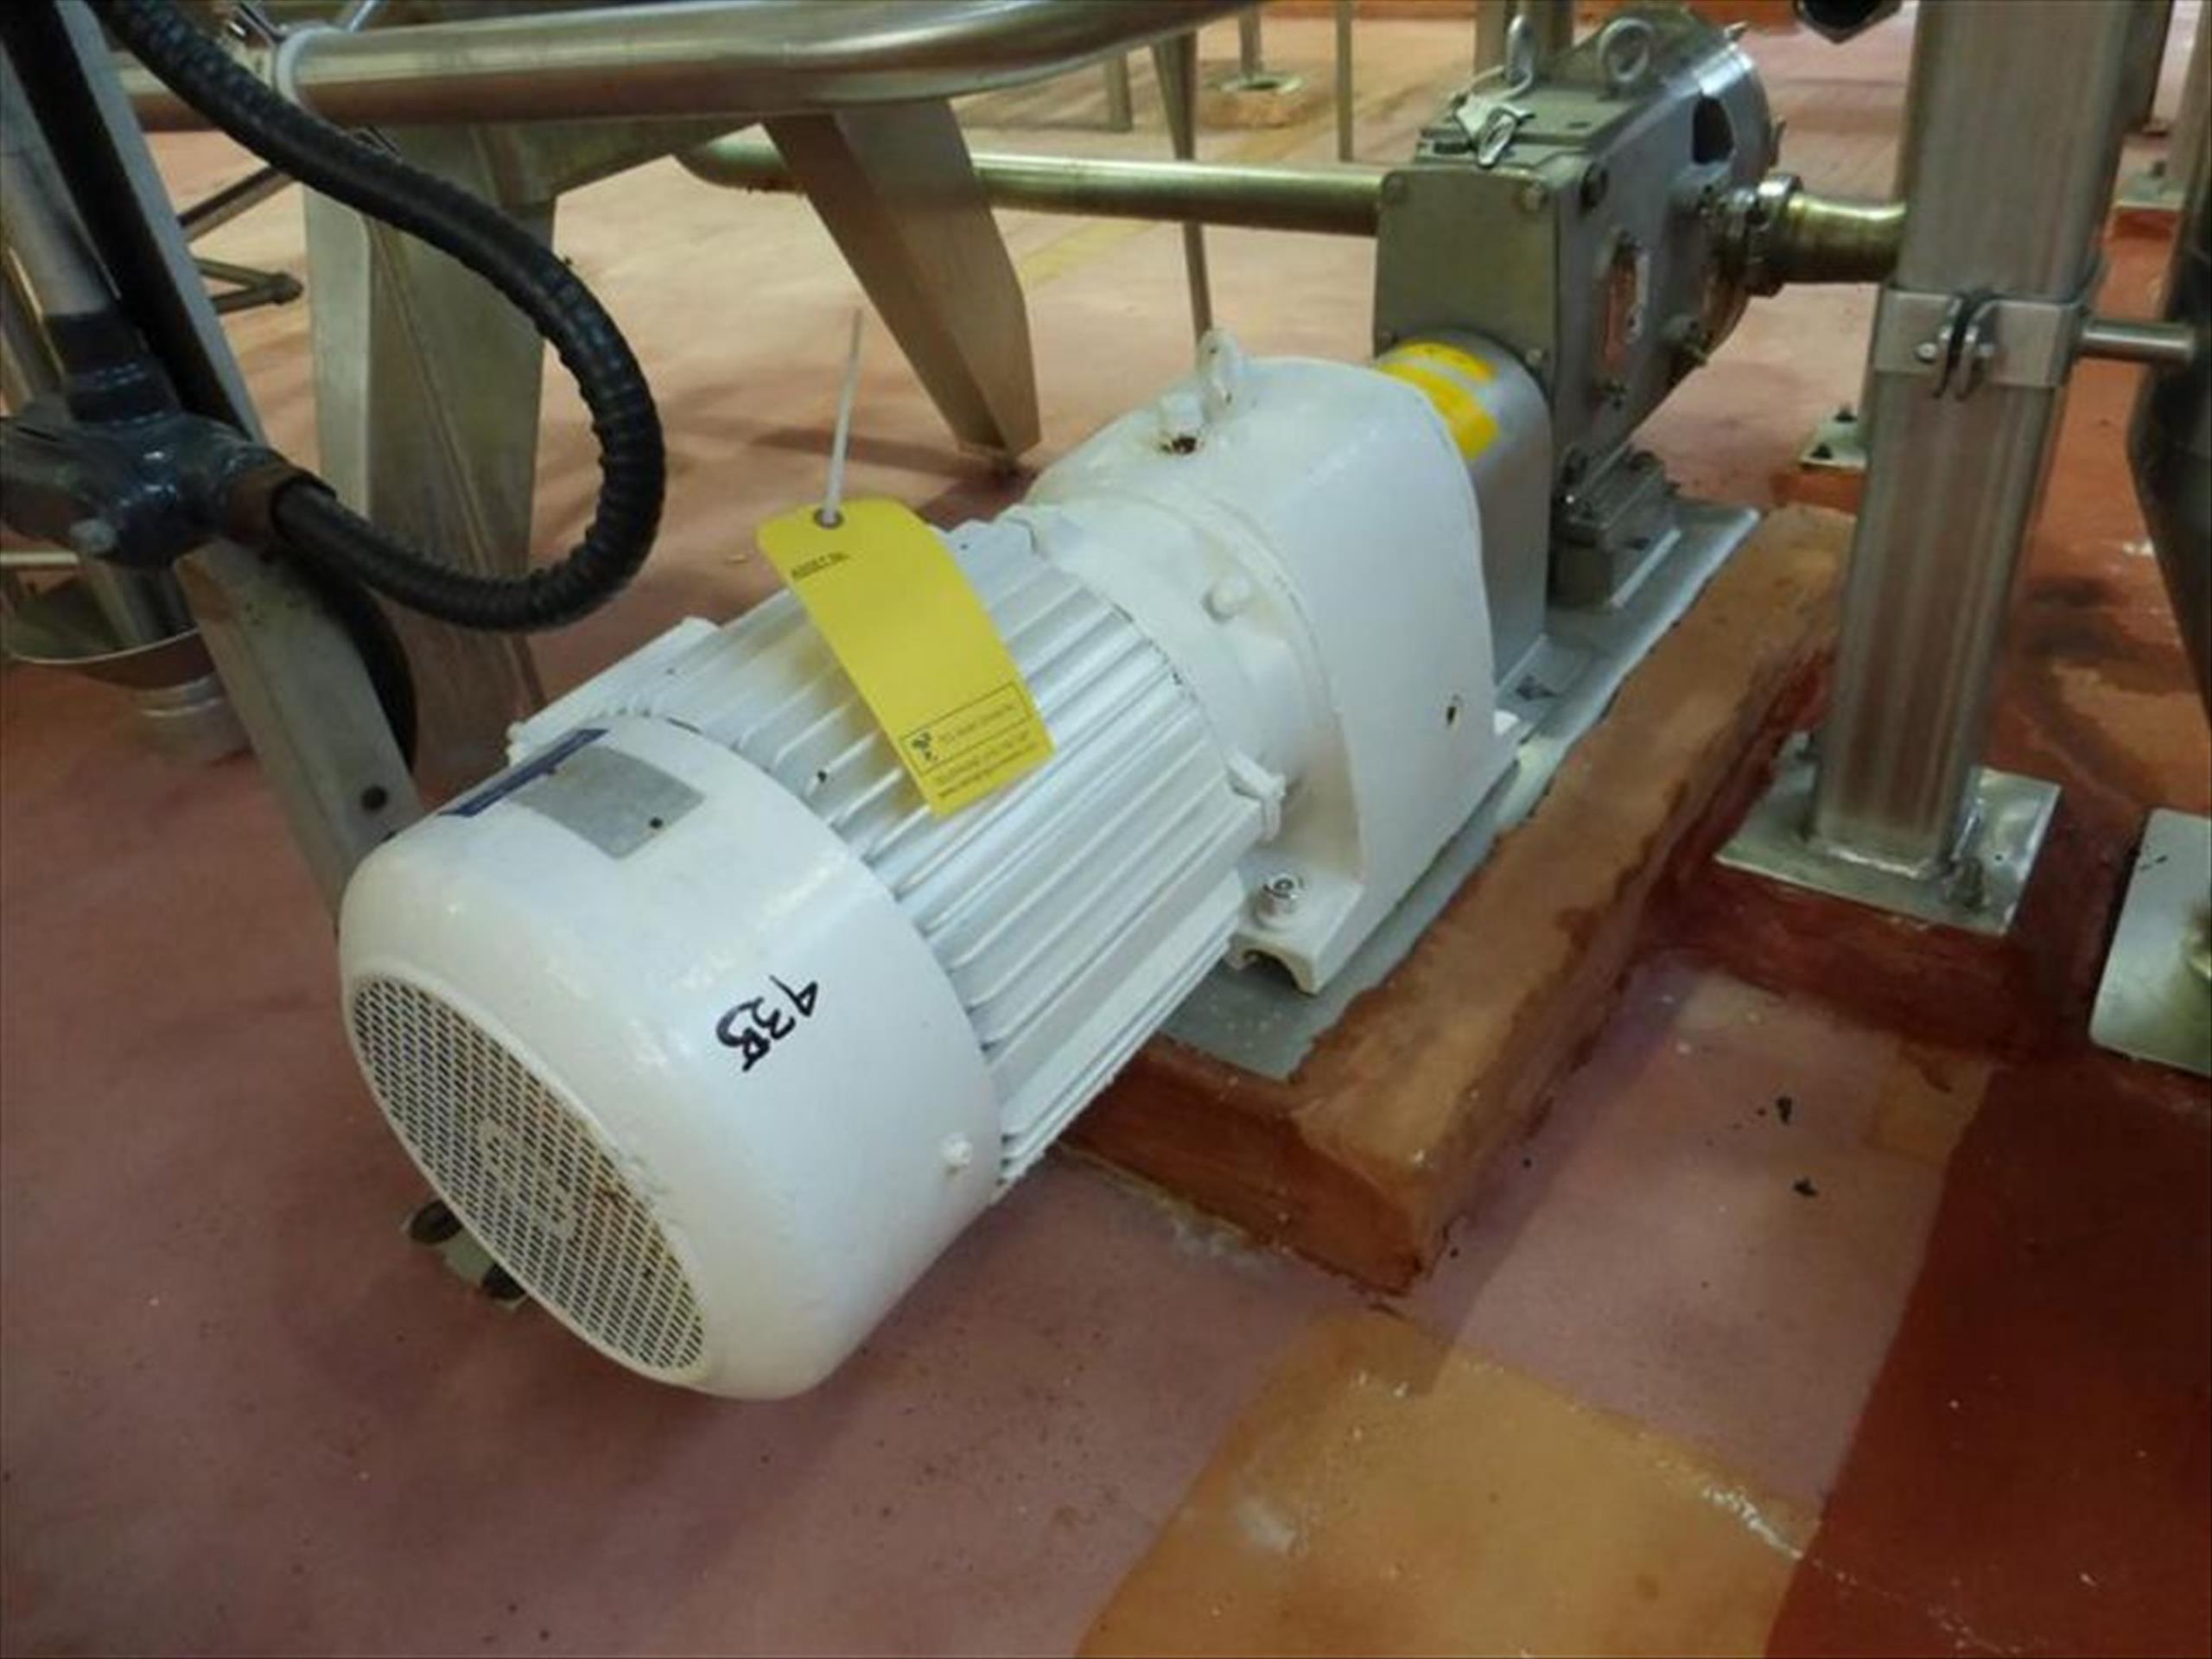 Waukesha positive displacement pump mod. no. 130 - U1 ser. no. 100000325-8459 stainless, approx 5hp,